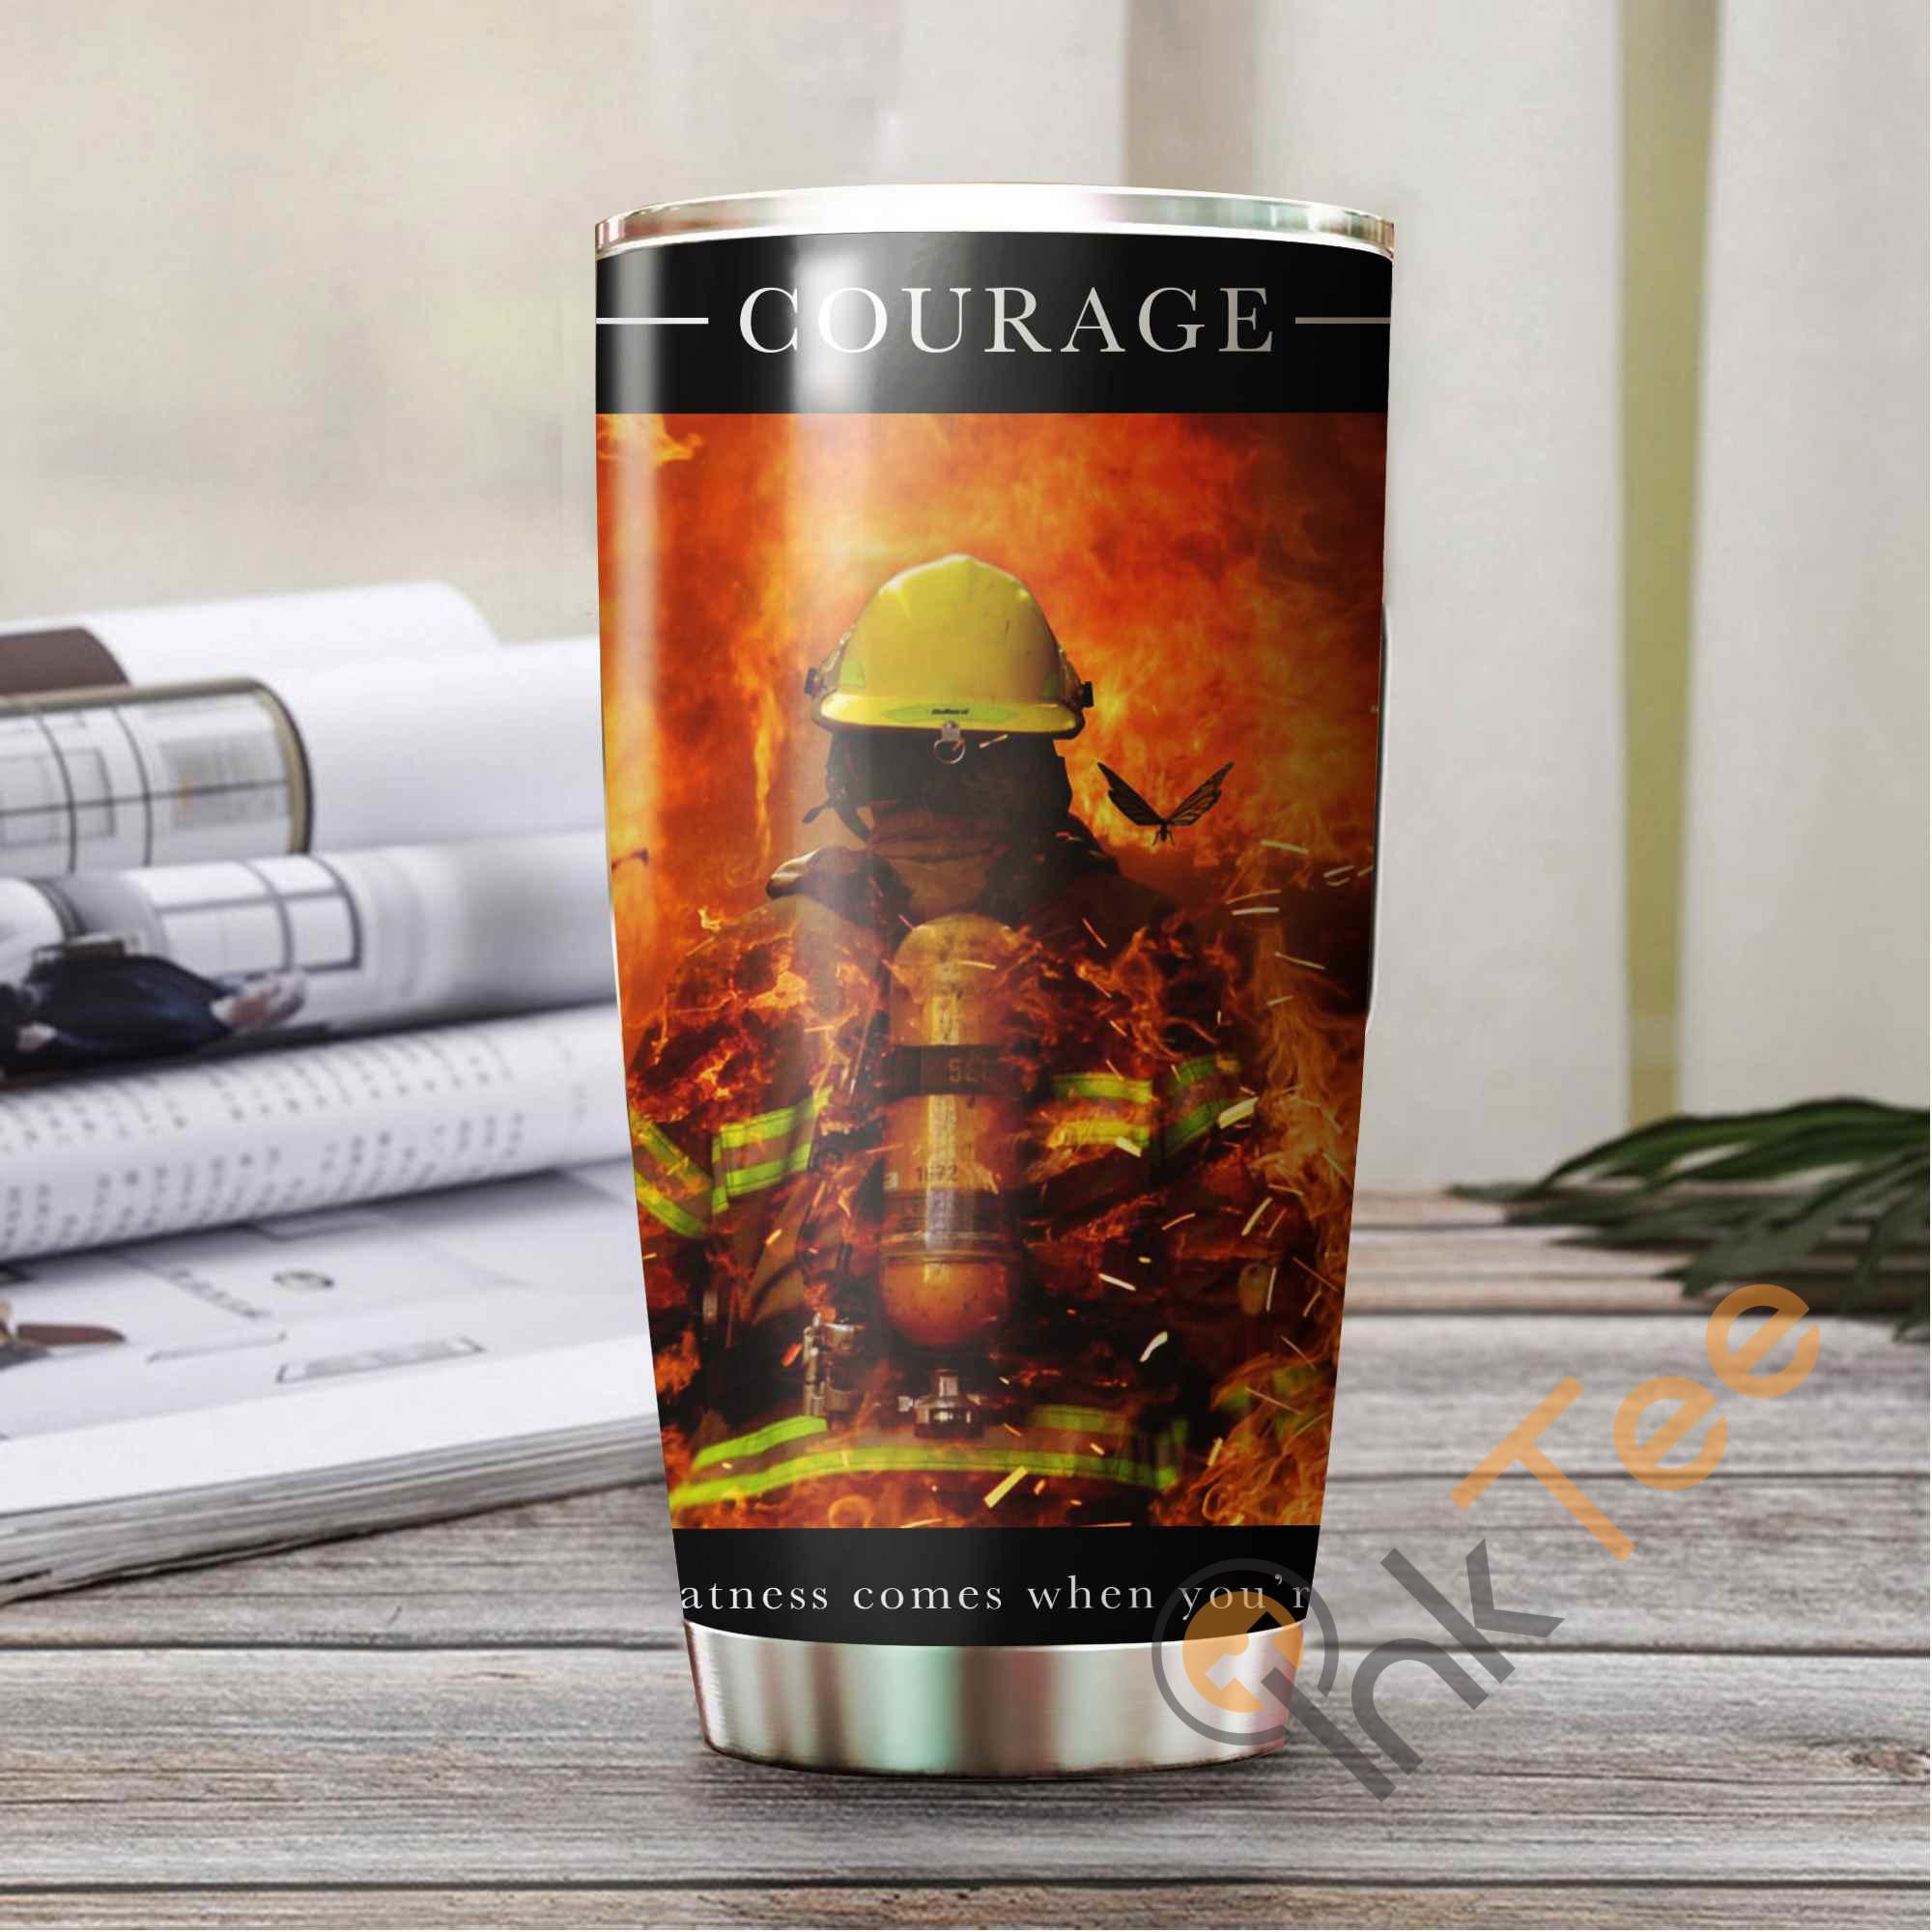 Firefighter's Courage Amazon Best Seller Sku 3495 Stainless Steel Tumbler